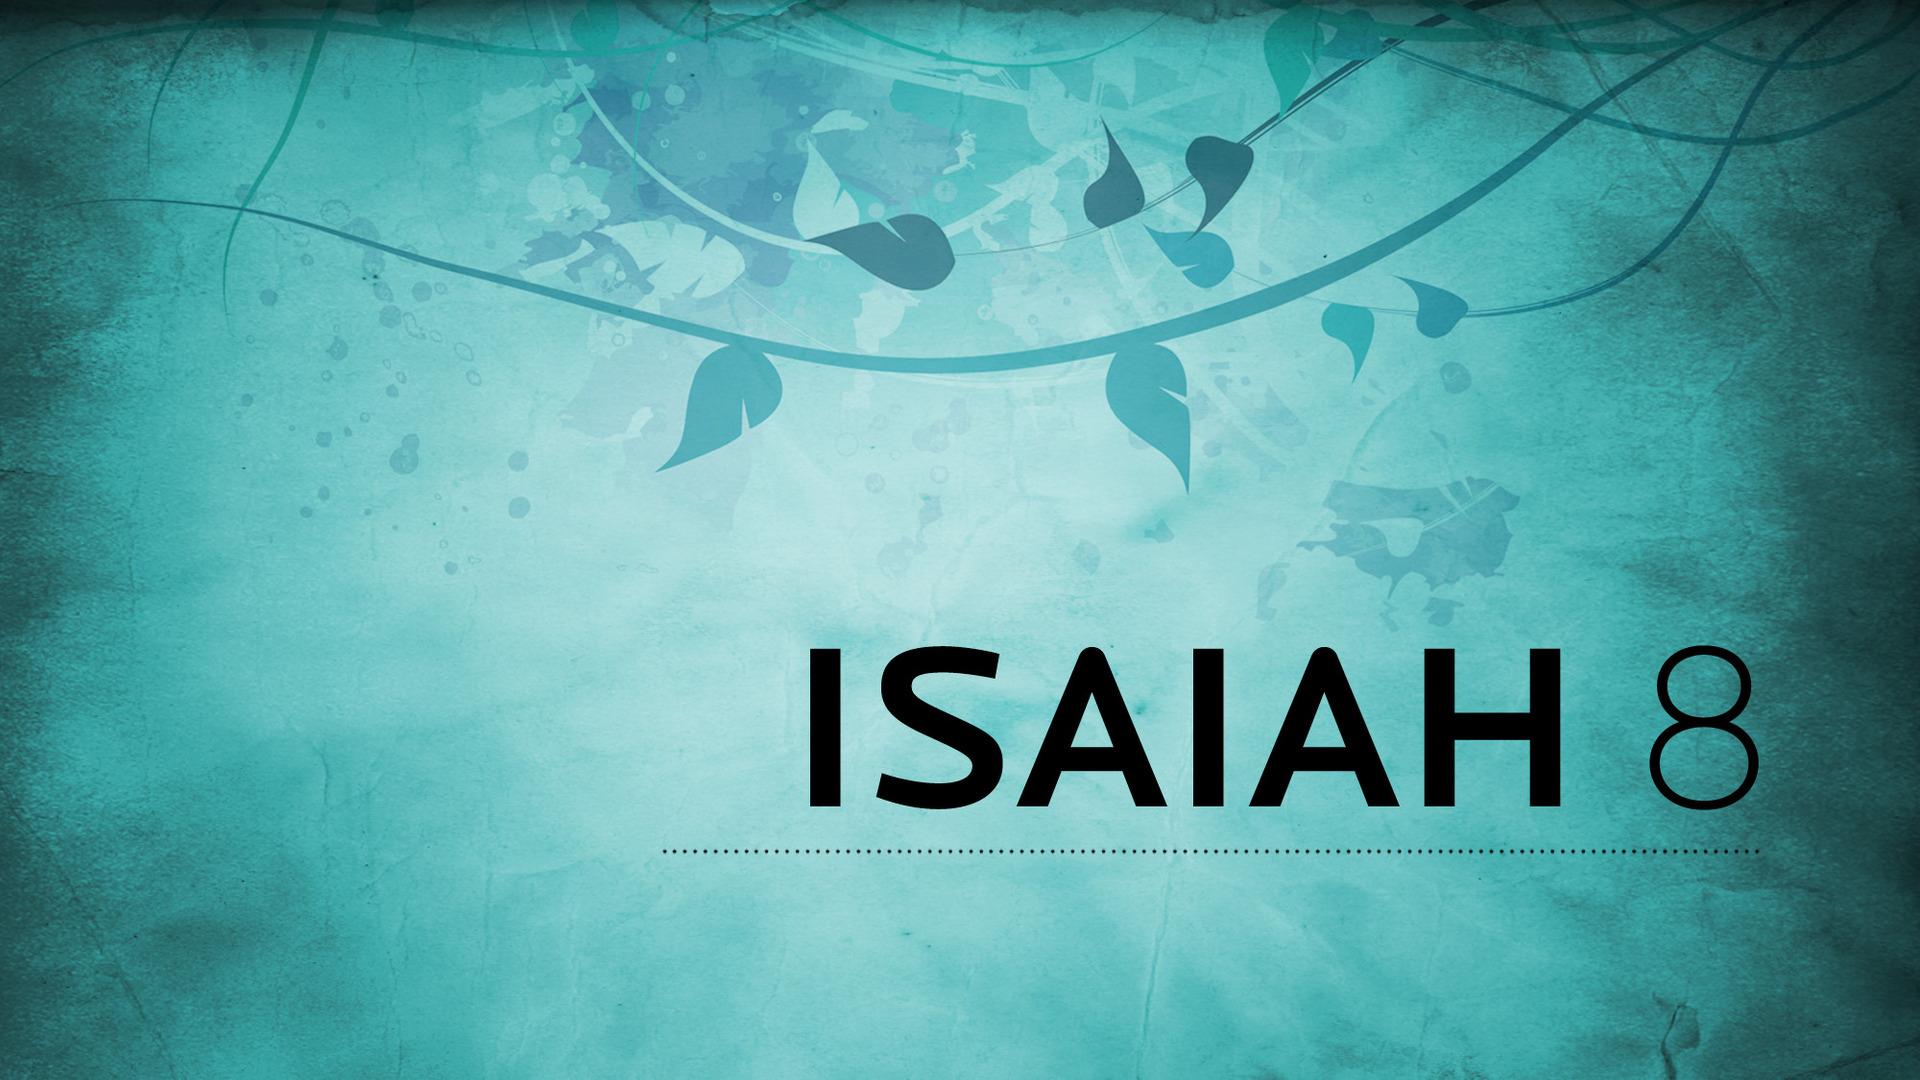 Isaiah 8